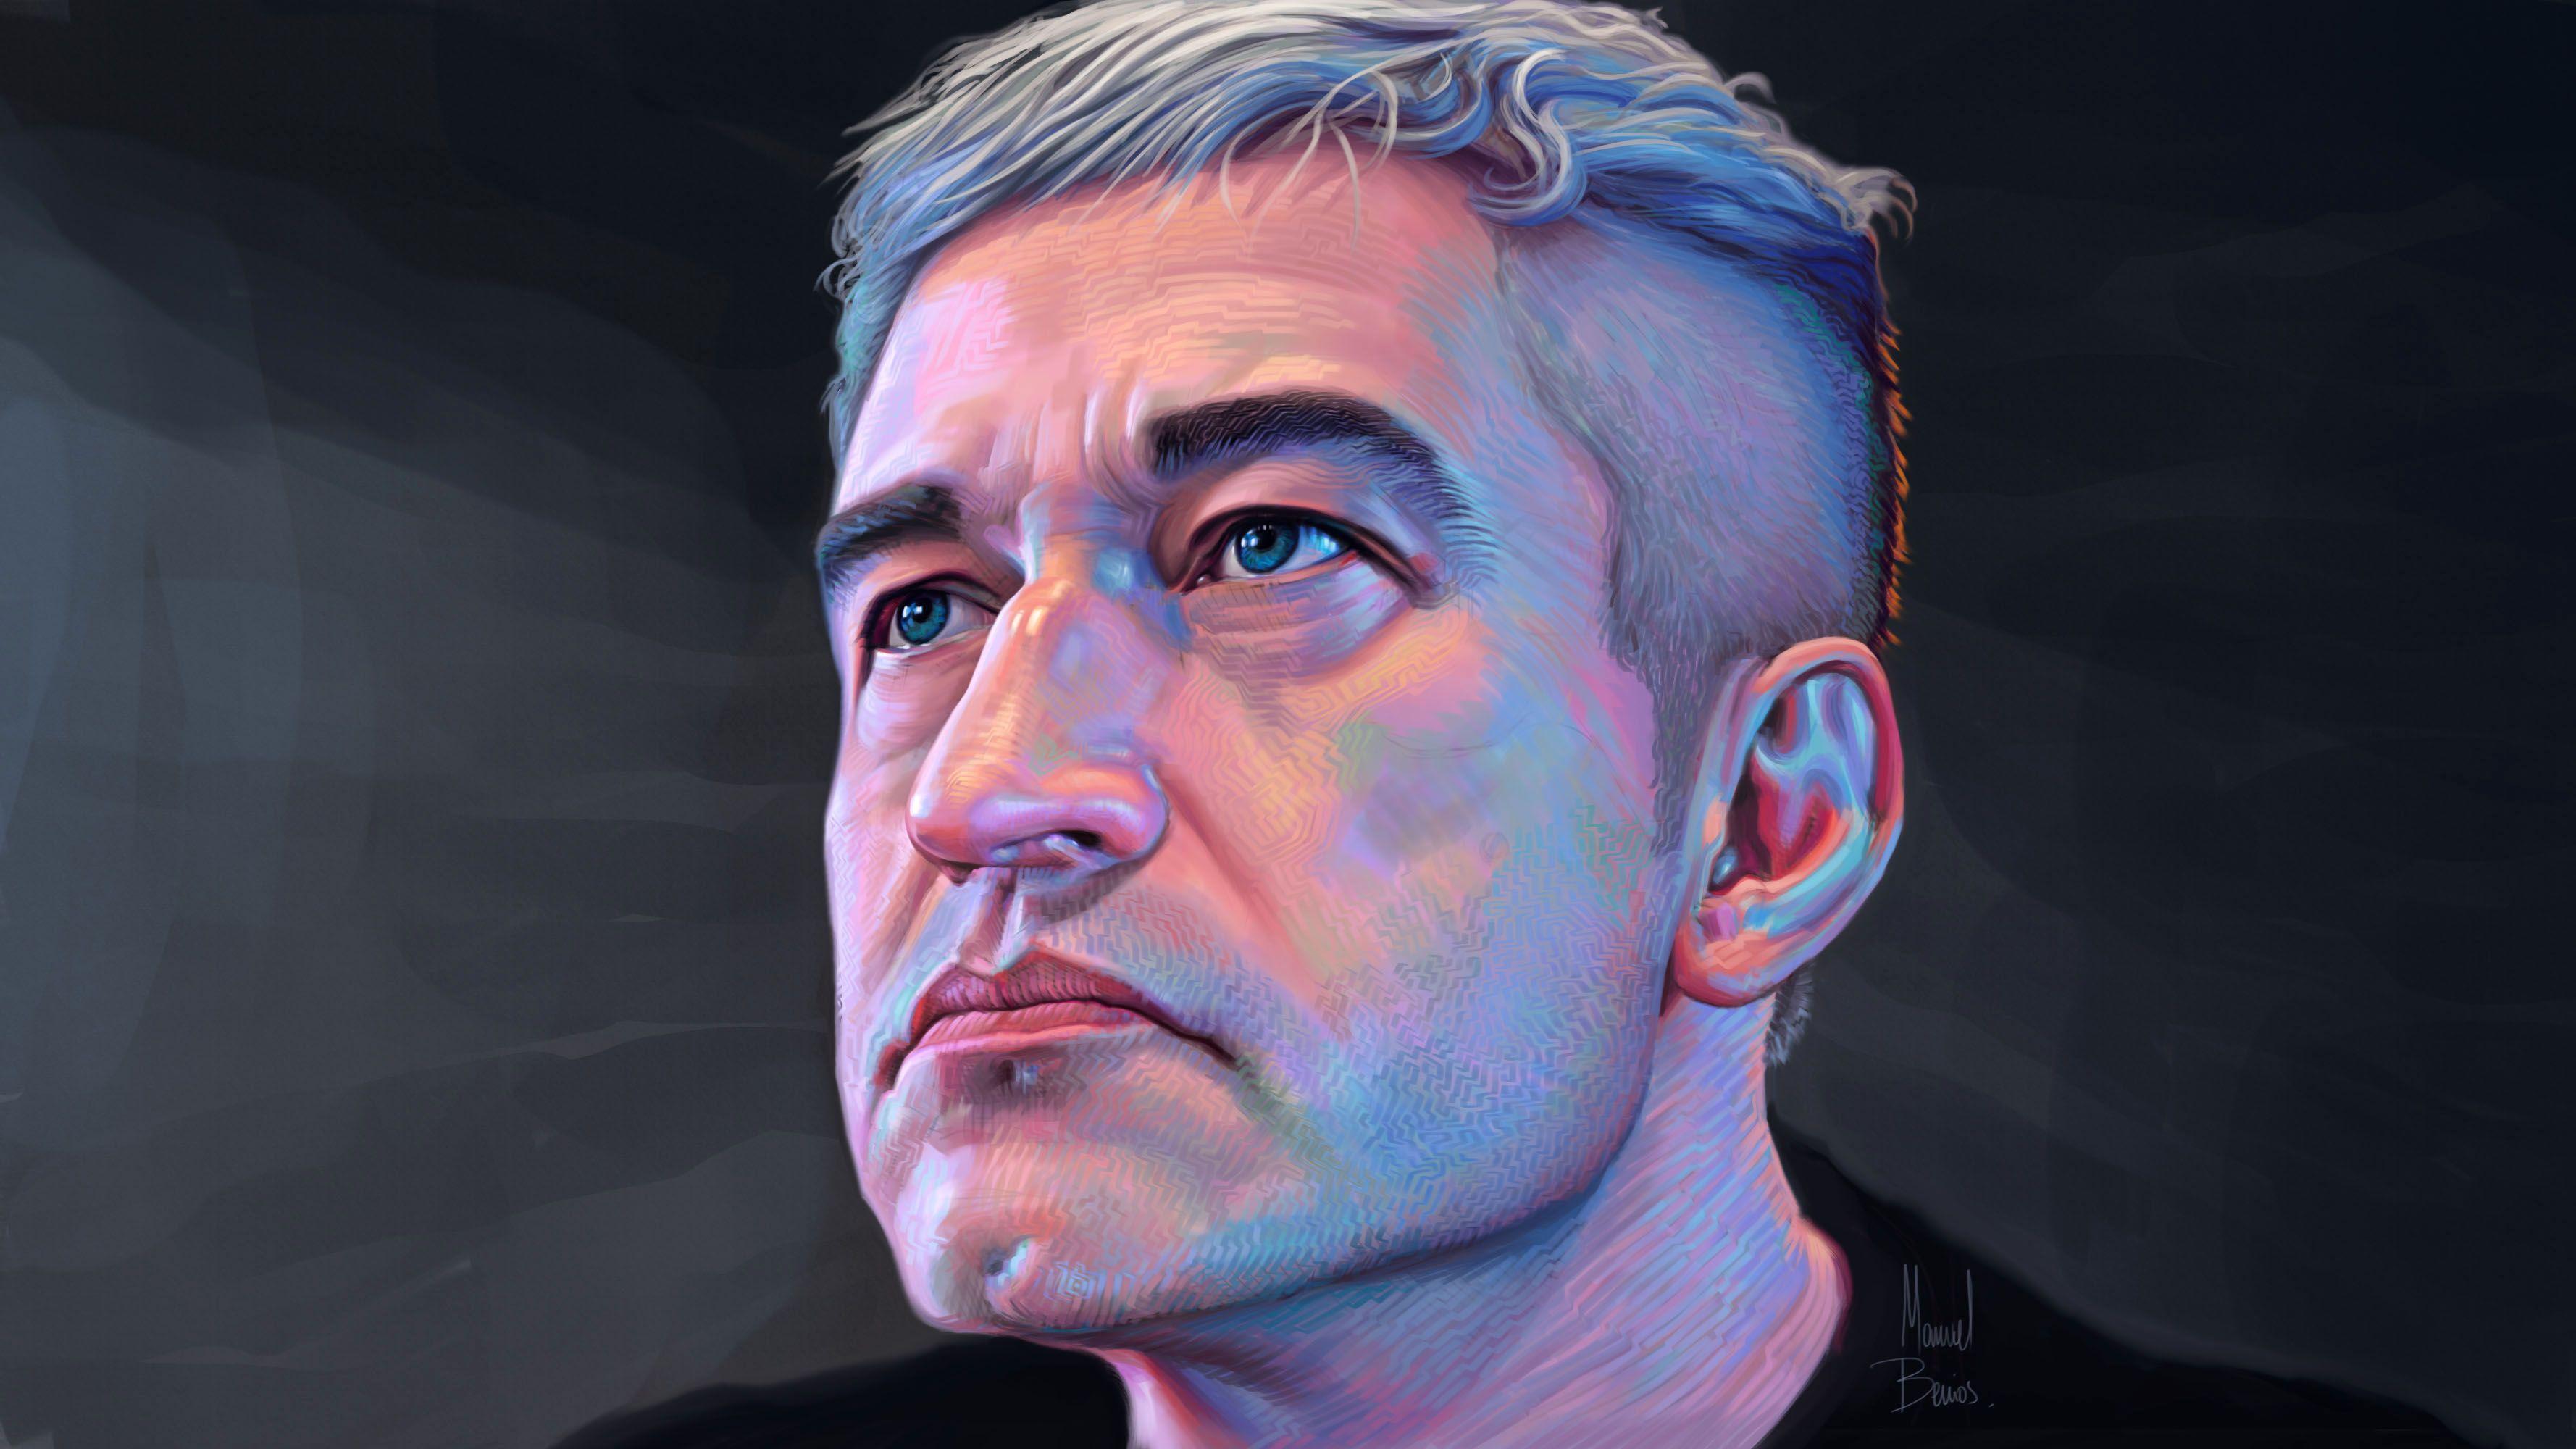 ... Con Mucho Respeto para Jorge González ... by Manuel Berrios C.